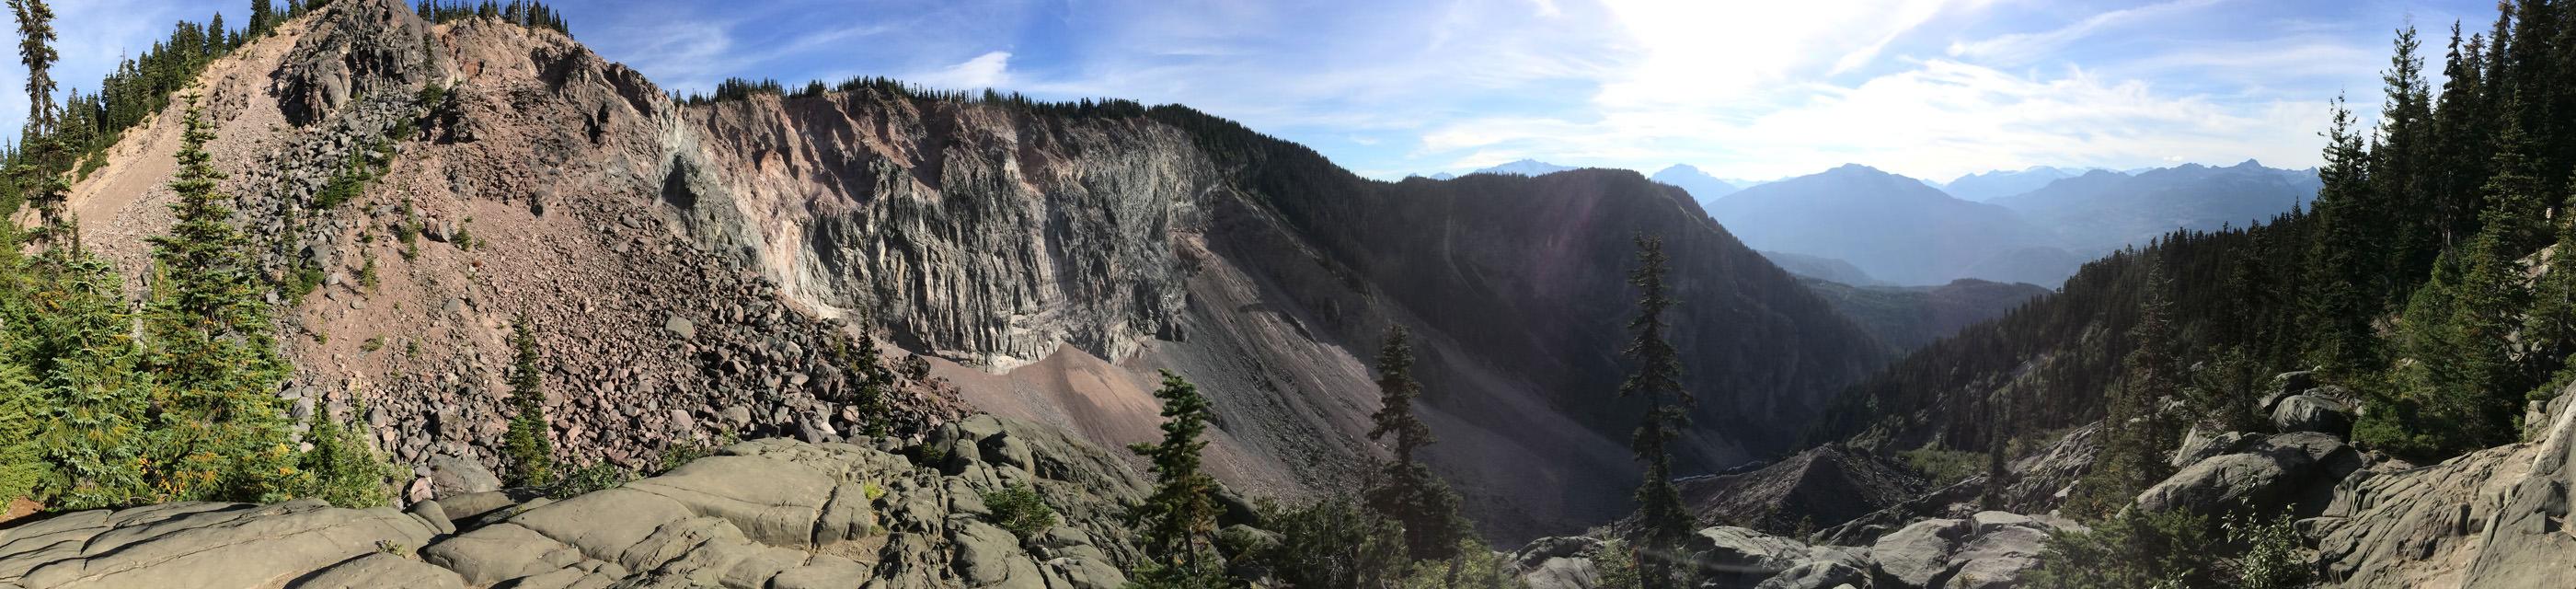 The Barrier lava dam panorama